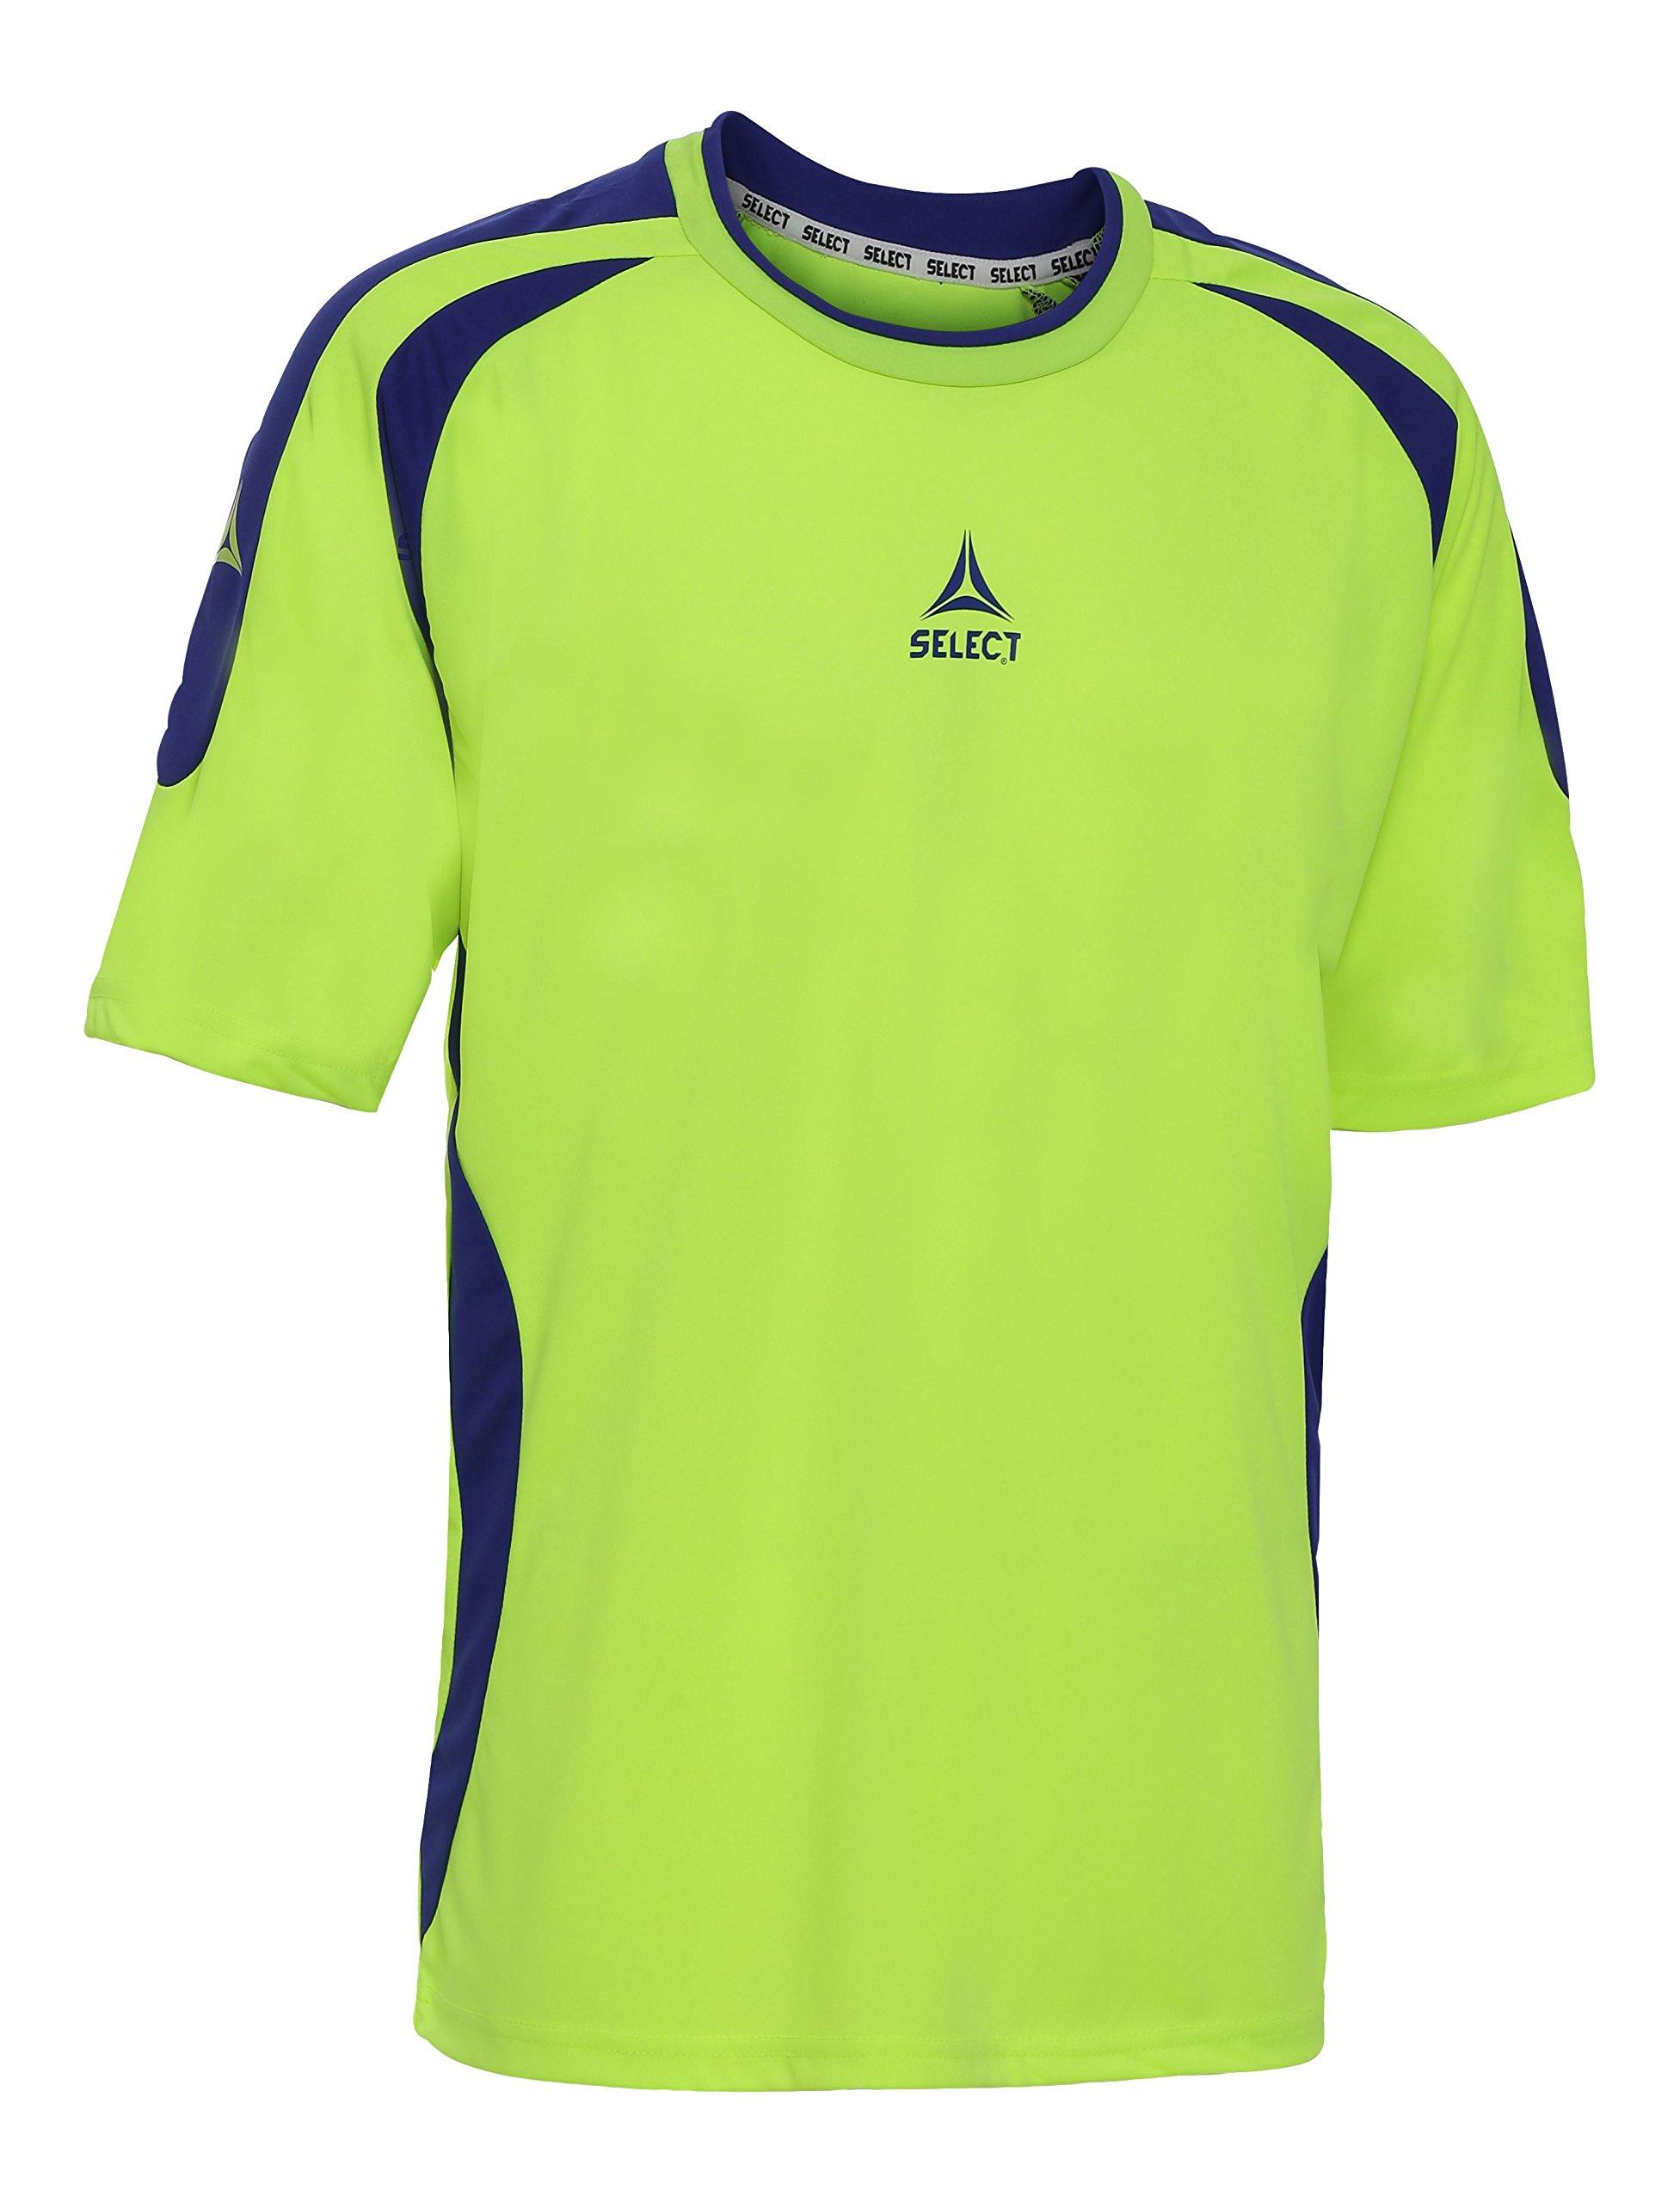 Select Sport America Texas Short Sleeve Goalkeeper Jersey